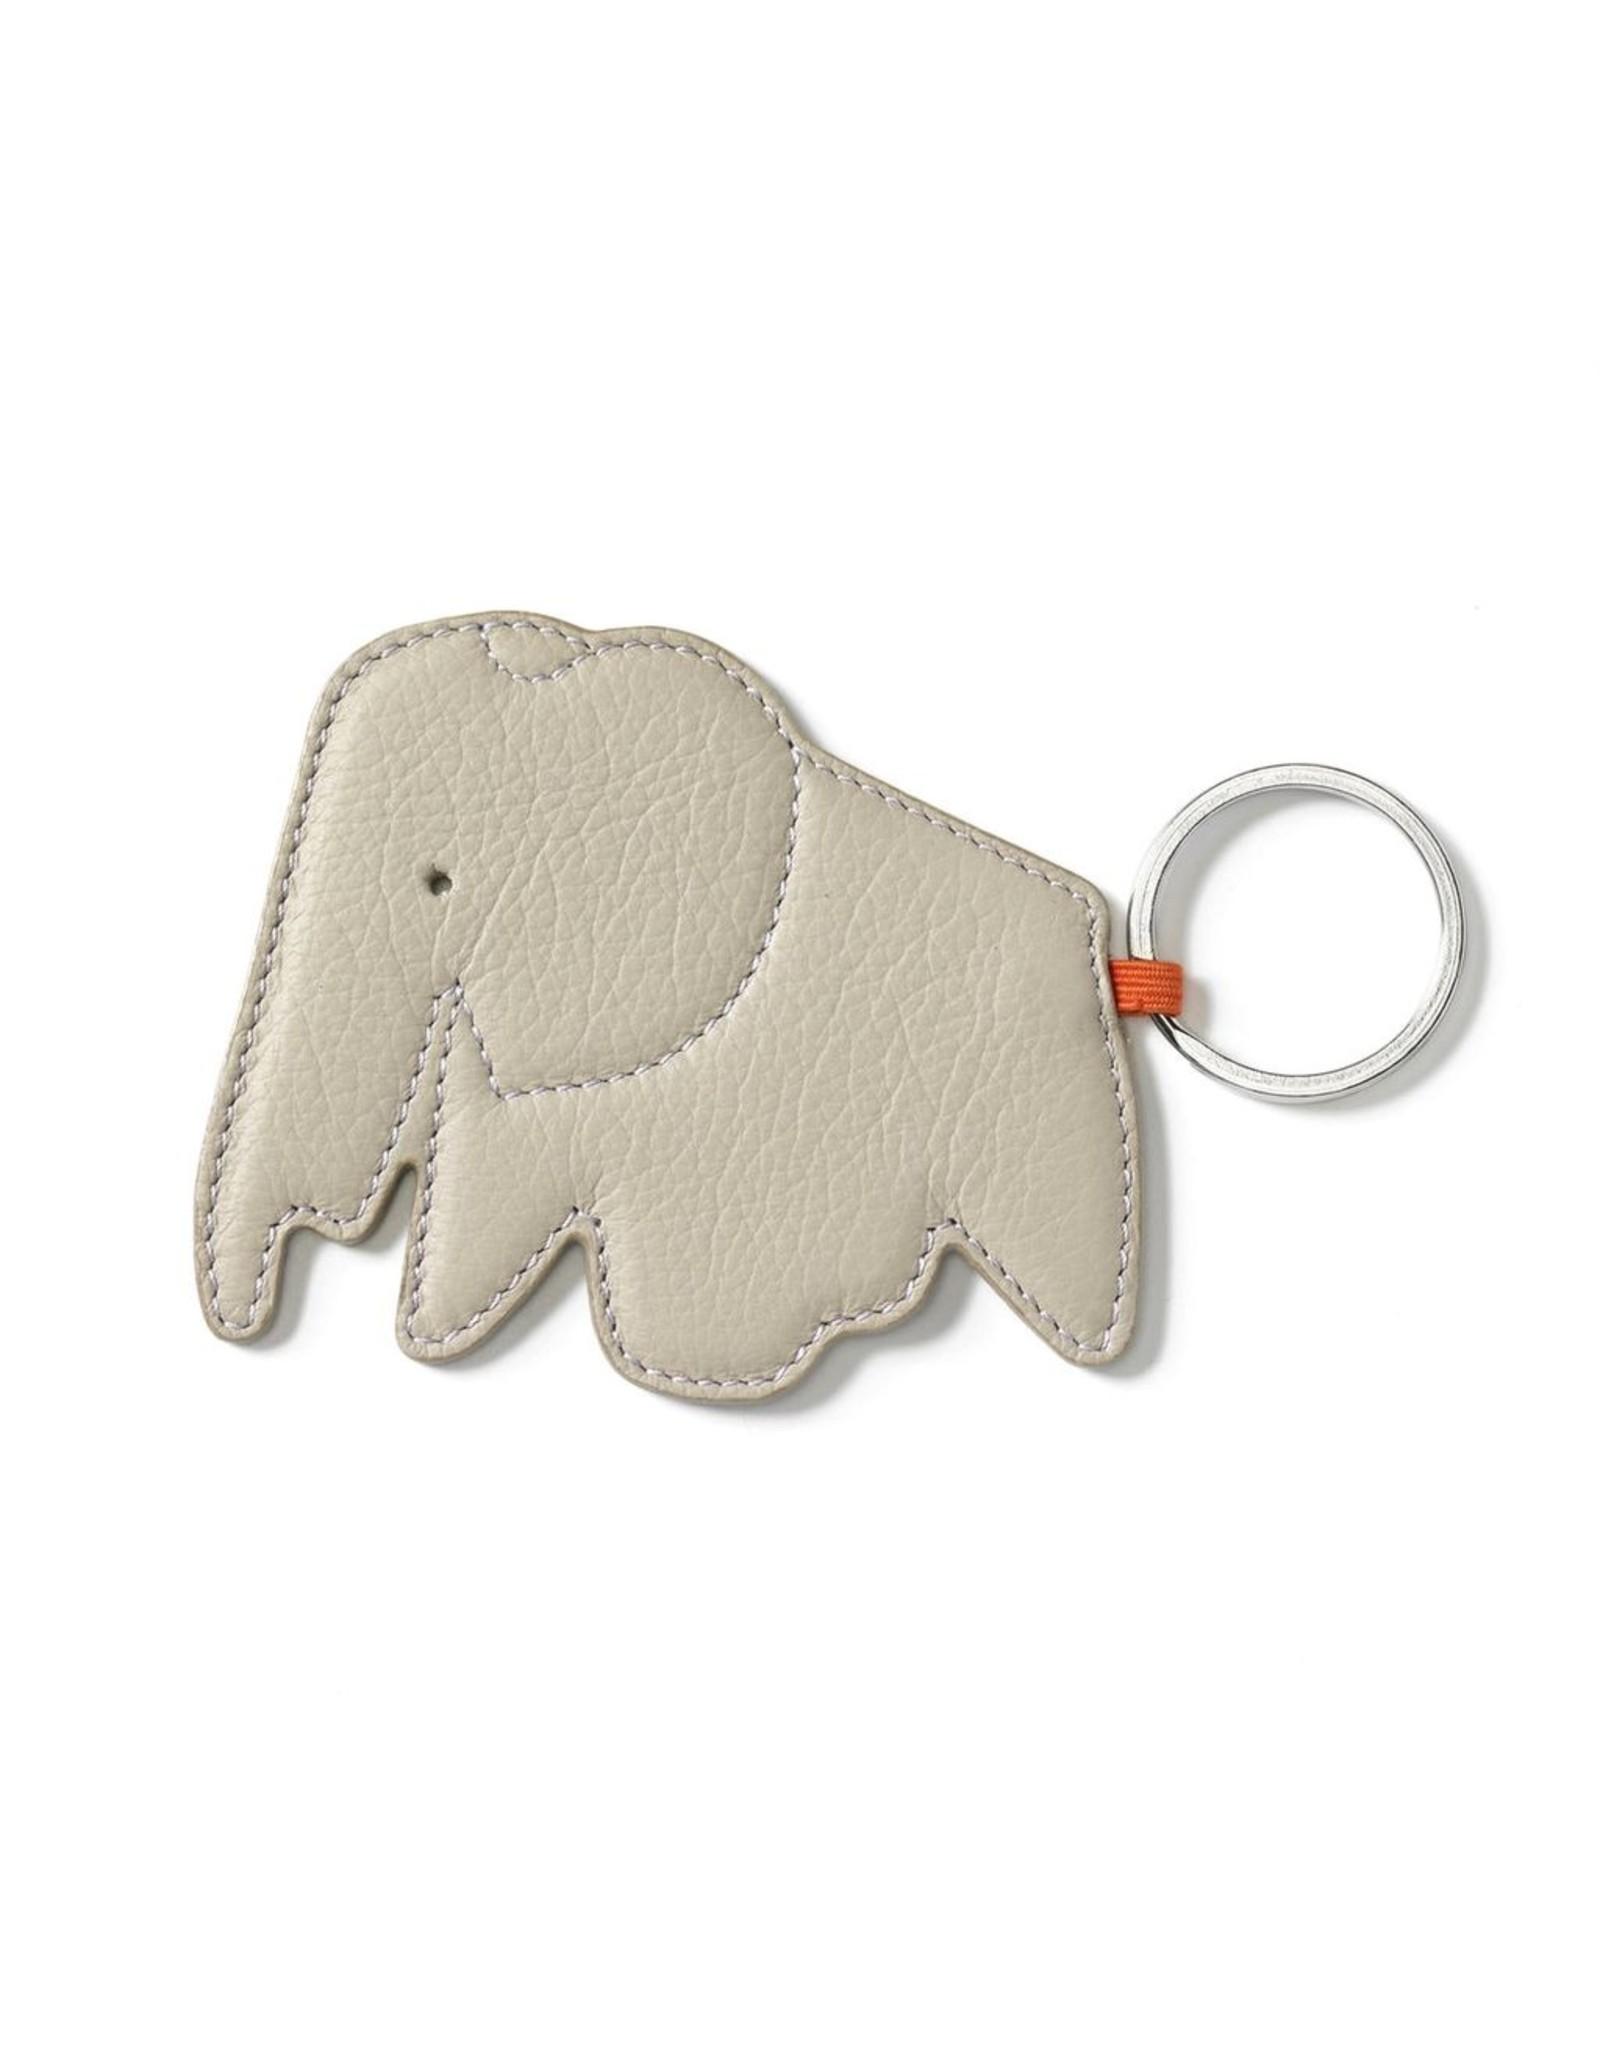 VITRA KEY RING ELEPHANT SAND